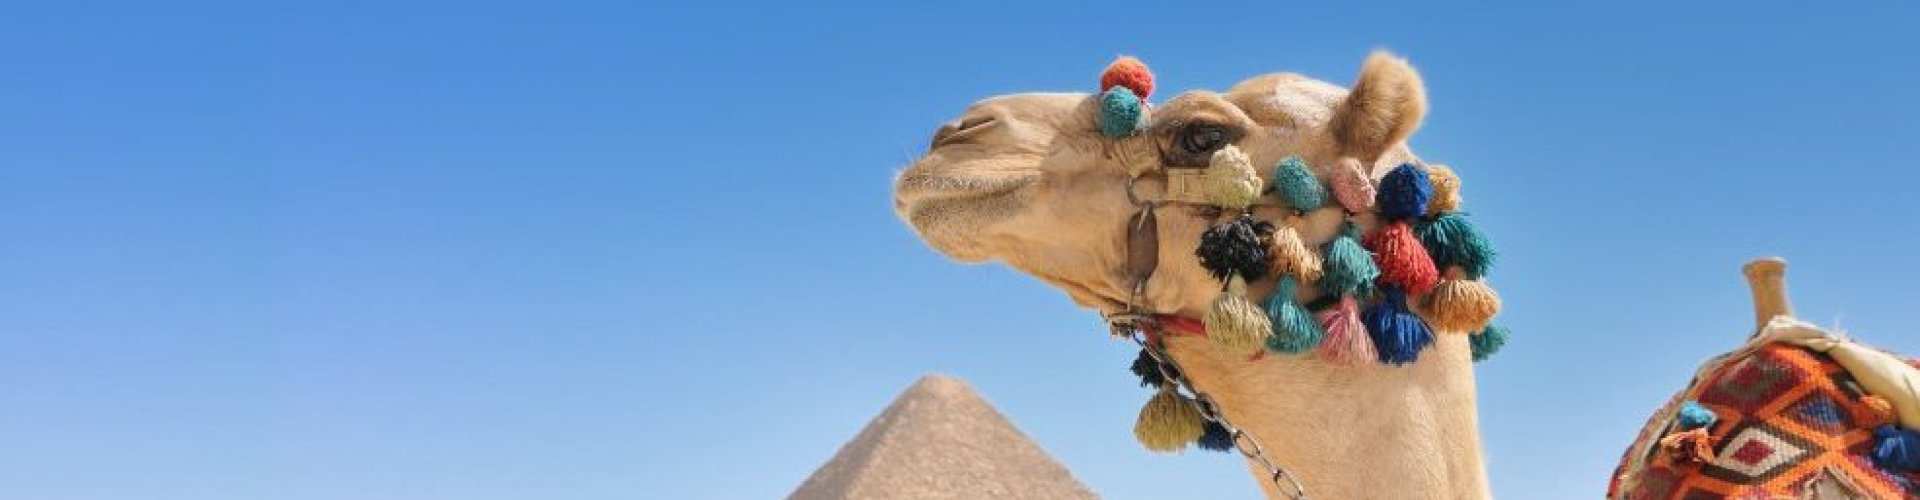 Familienhotels Ägypten